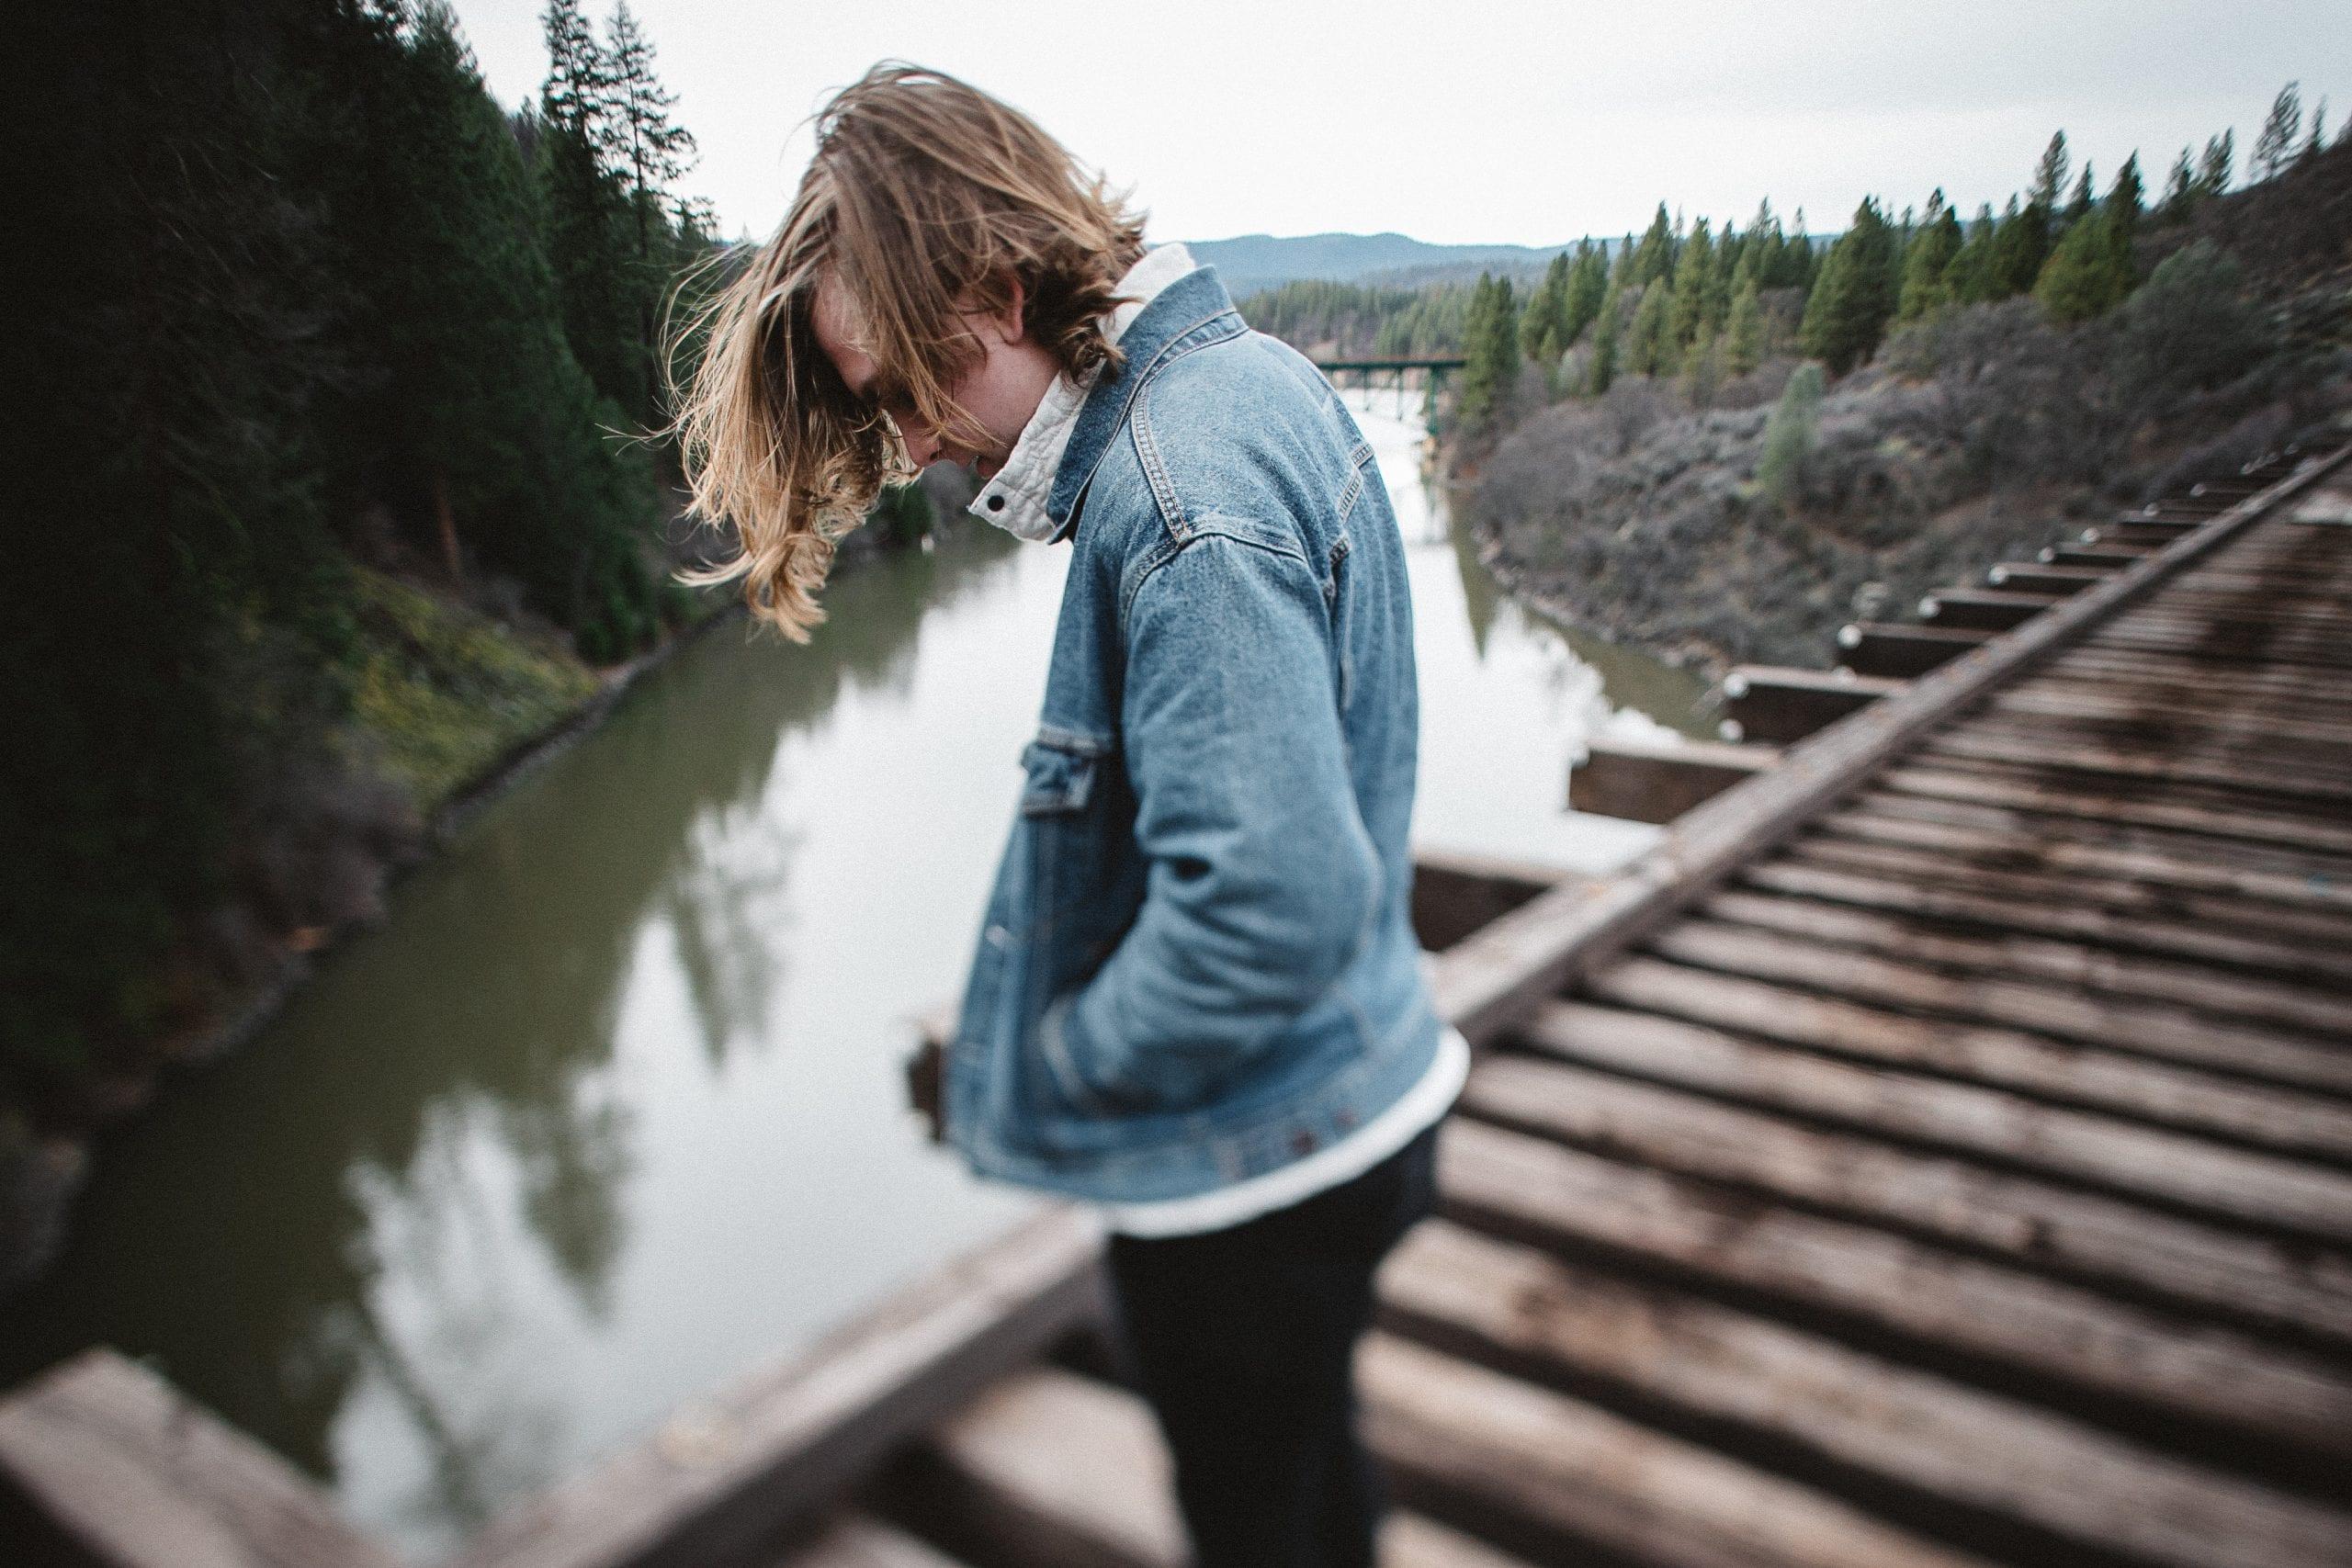 stand-by-me-bridge-burney-falls-lifestyle-photographer-15